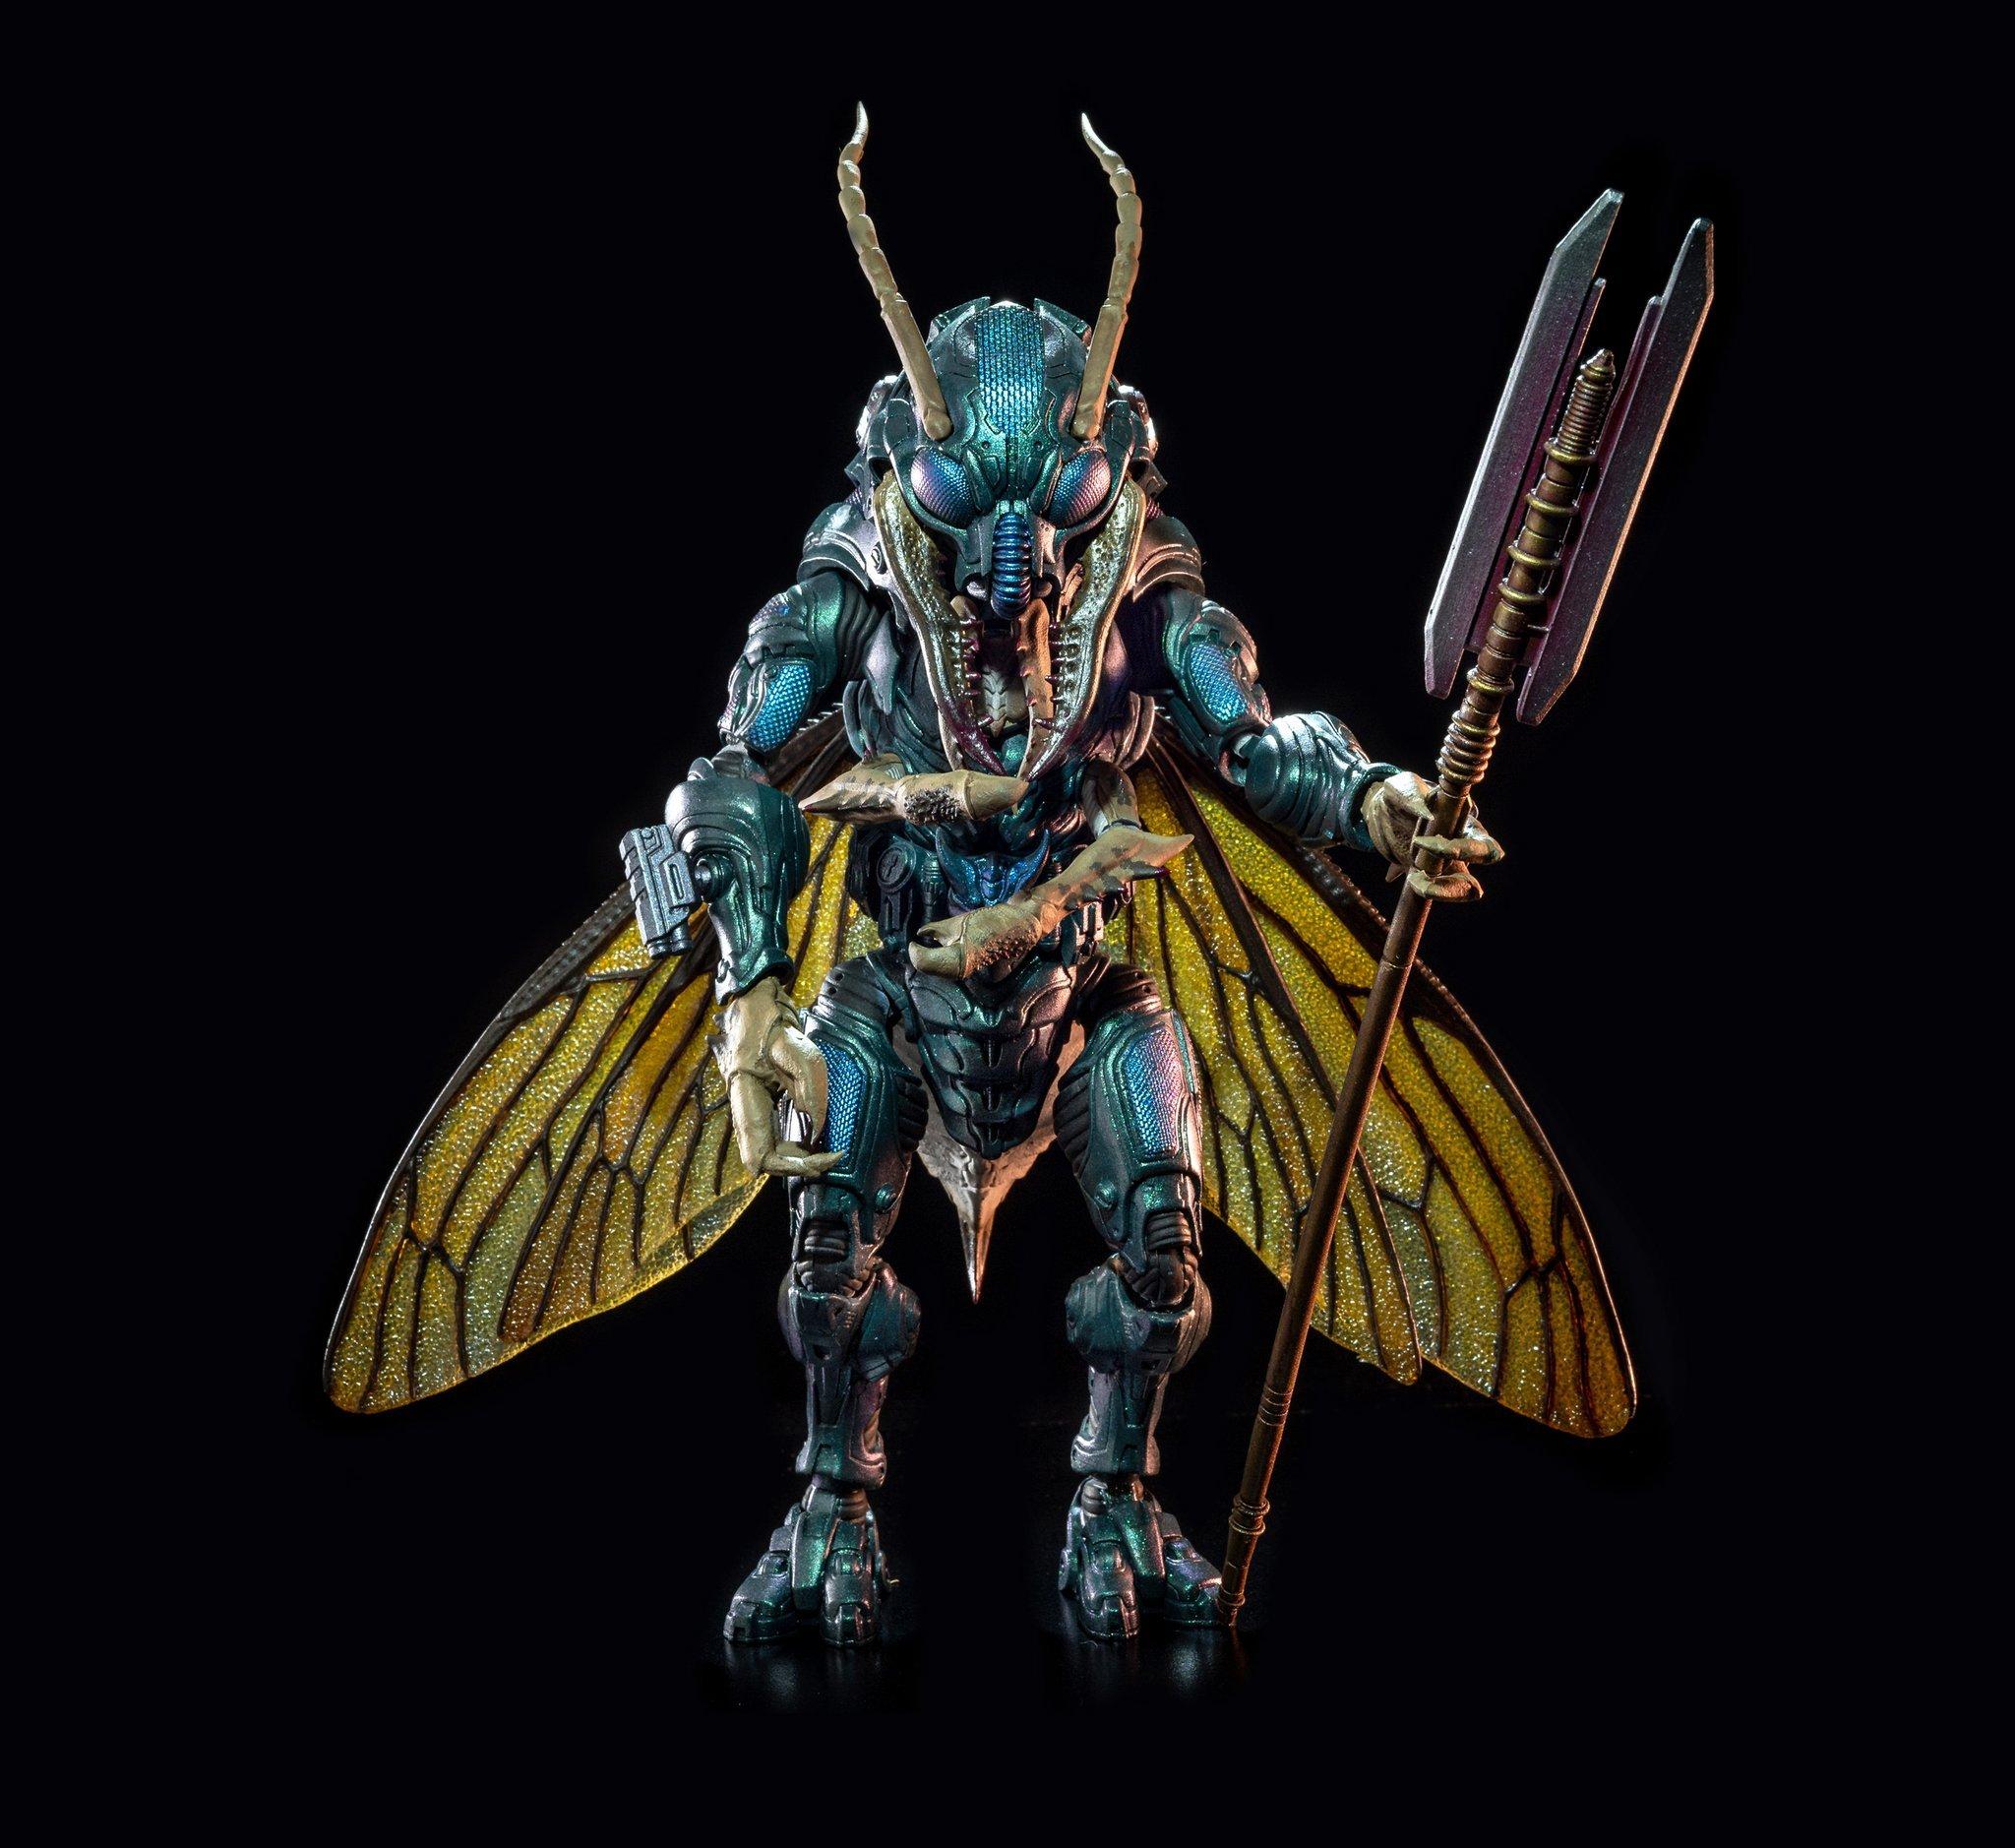 Sphexx-Guard-Front_1024x1024@2x.jpg